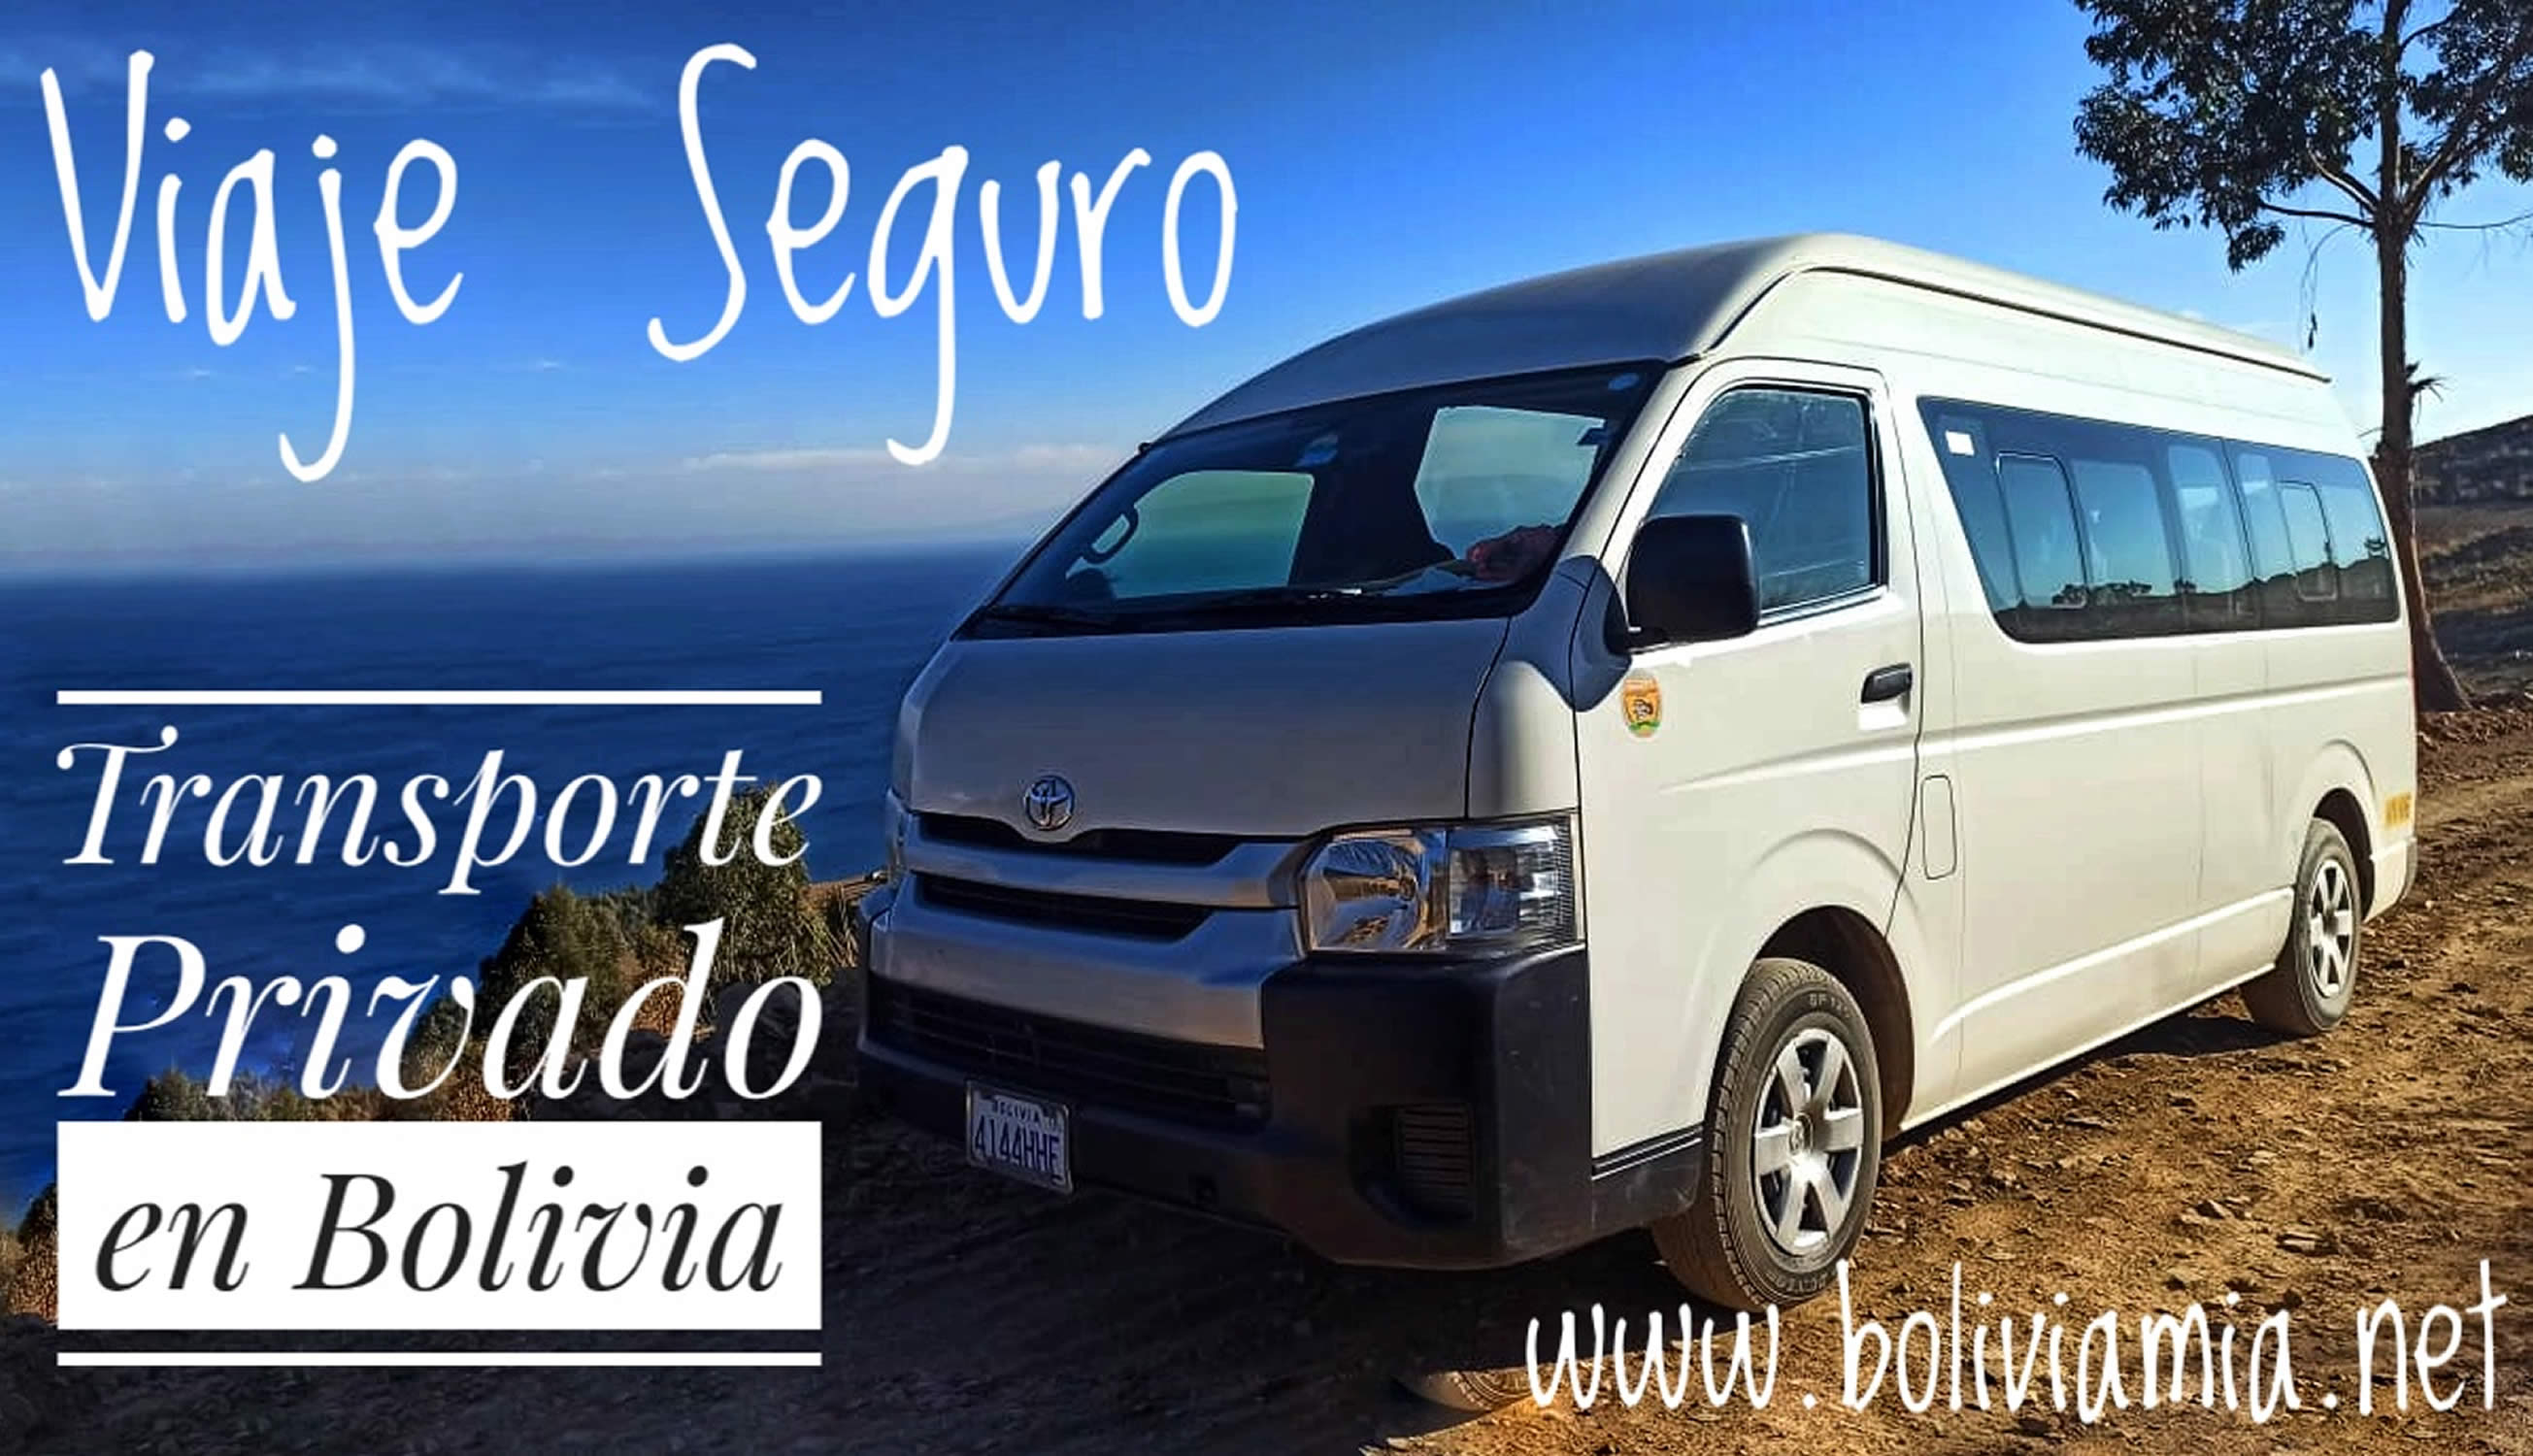 Transporte Privado en toda Bolivia